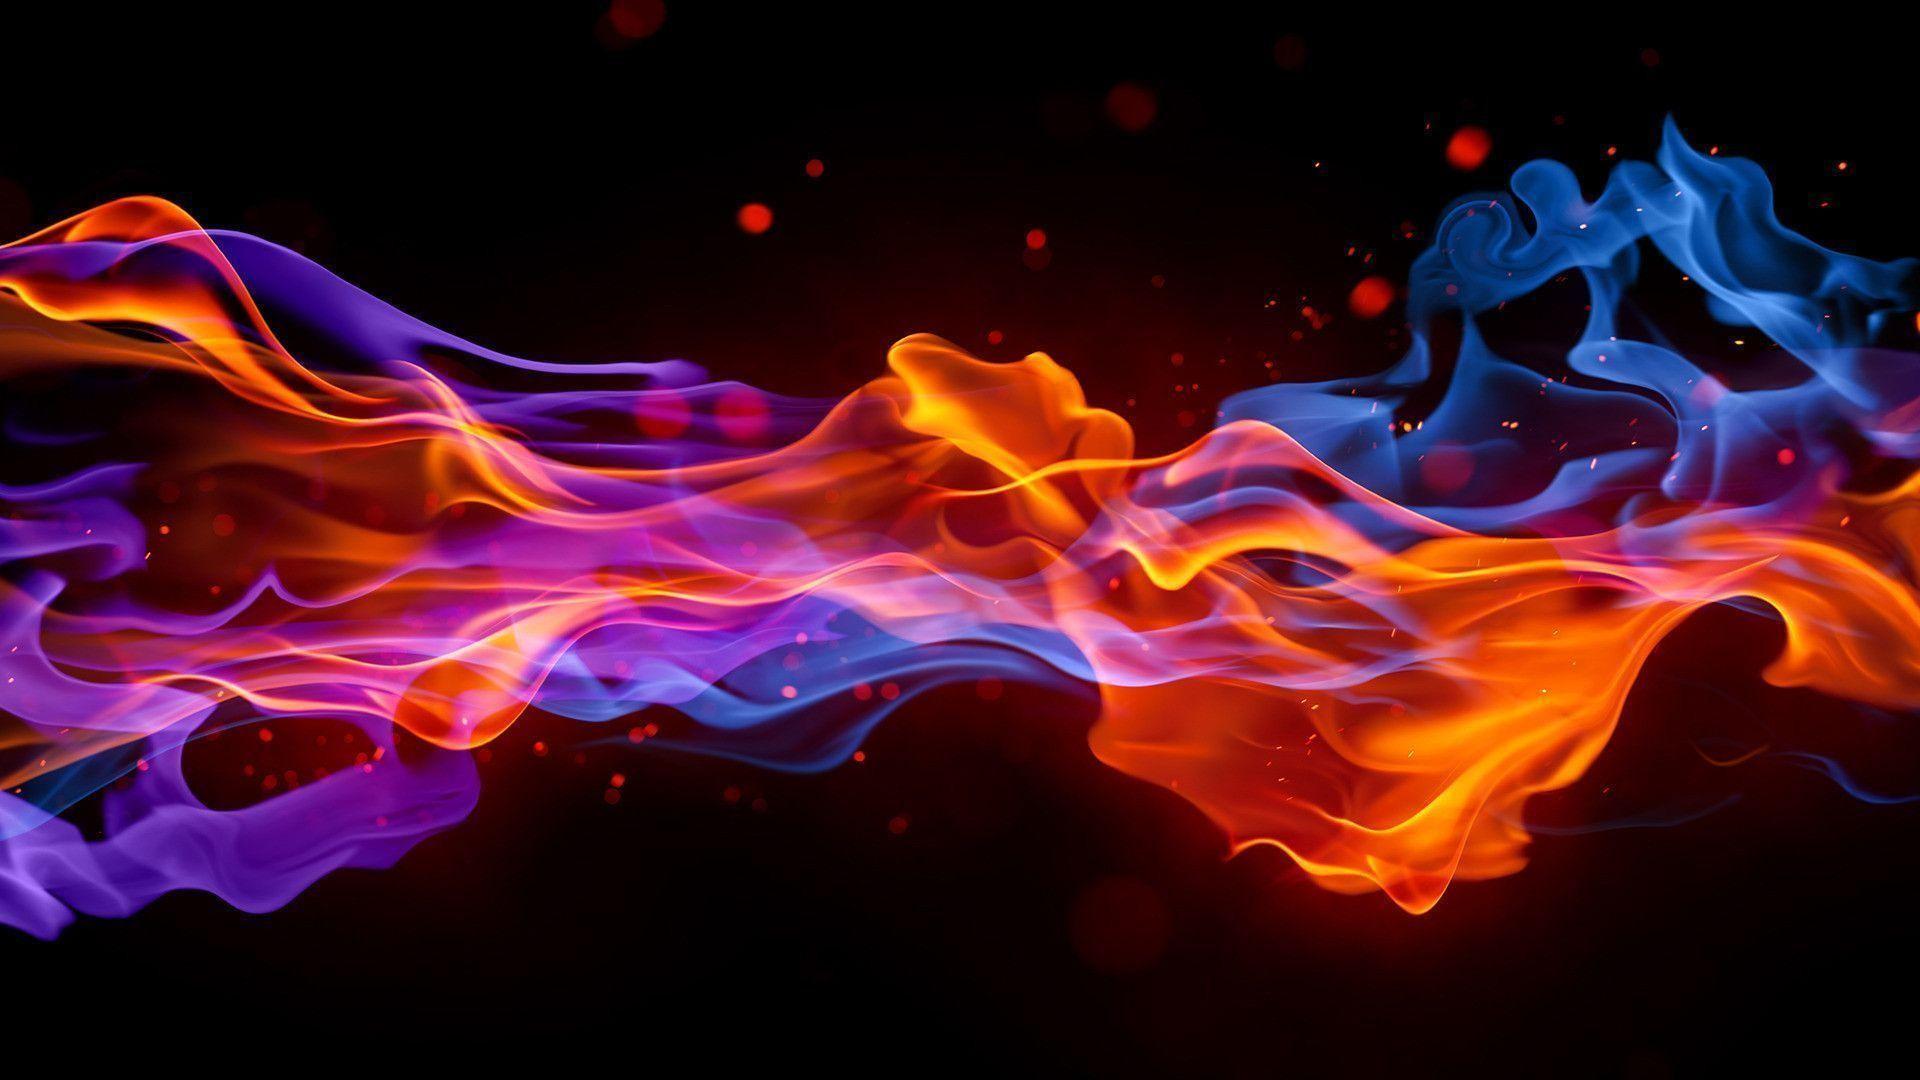 Blue Fire Wallpapers – HD Wallpapers Inn